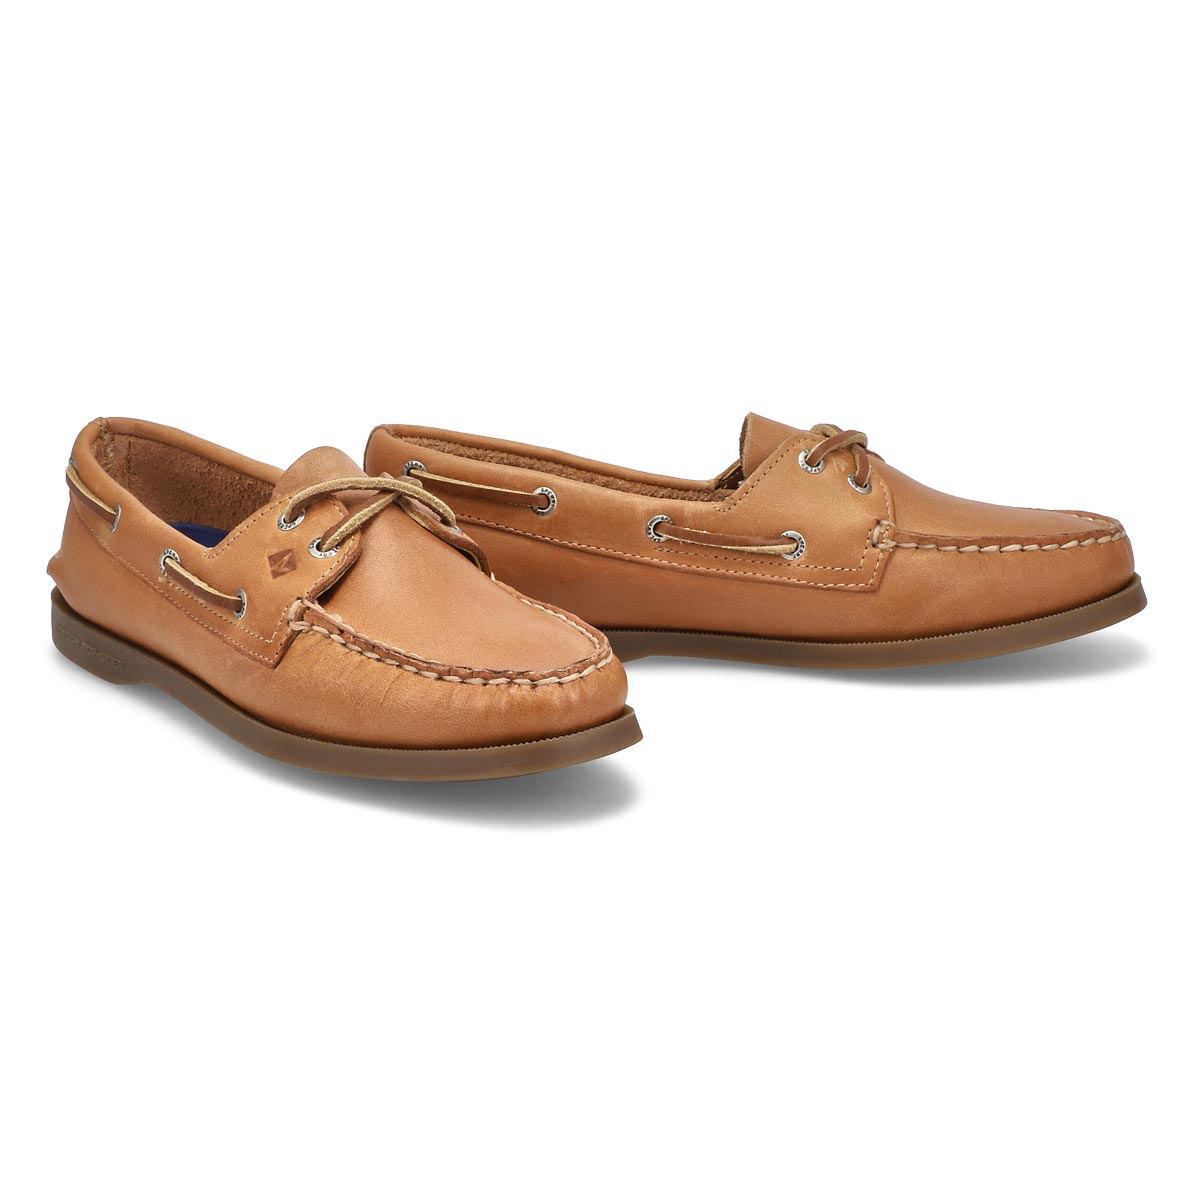 Lds A/O 2-eye sahara boat shoe